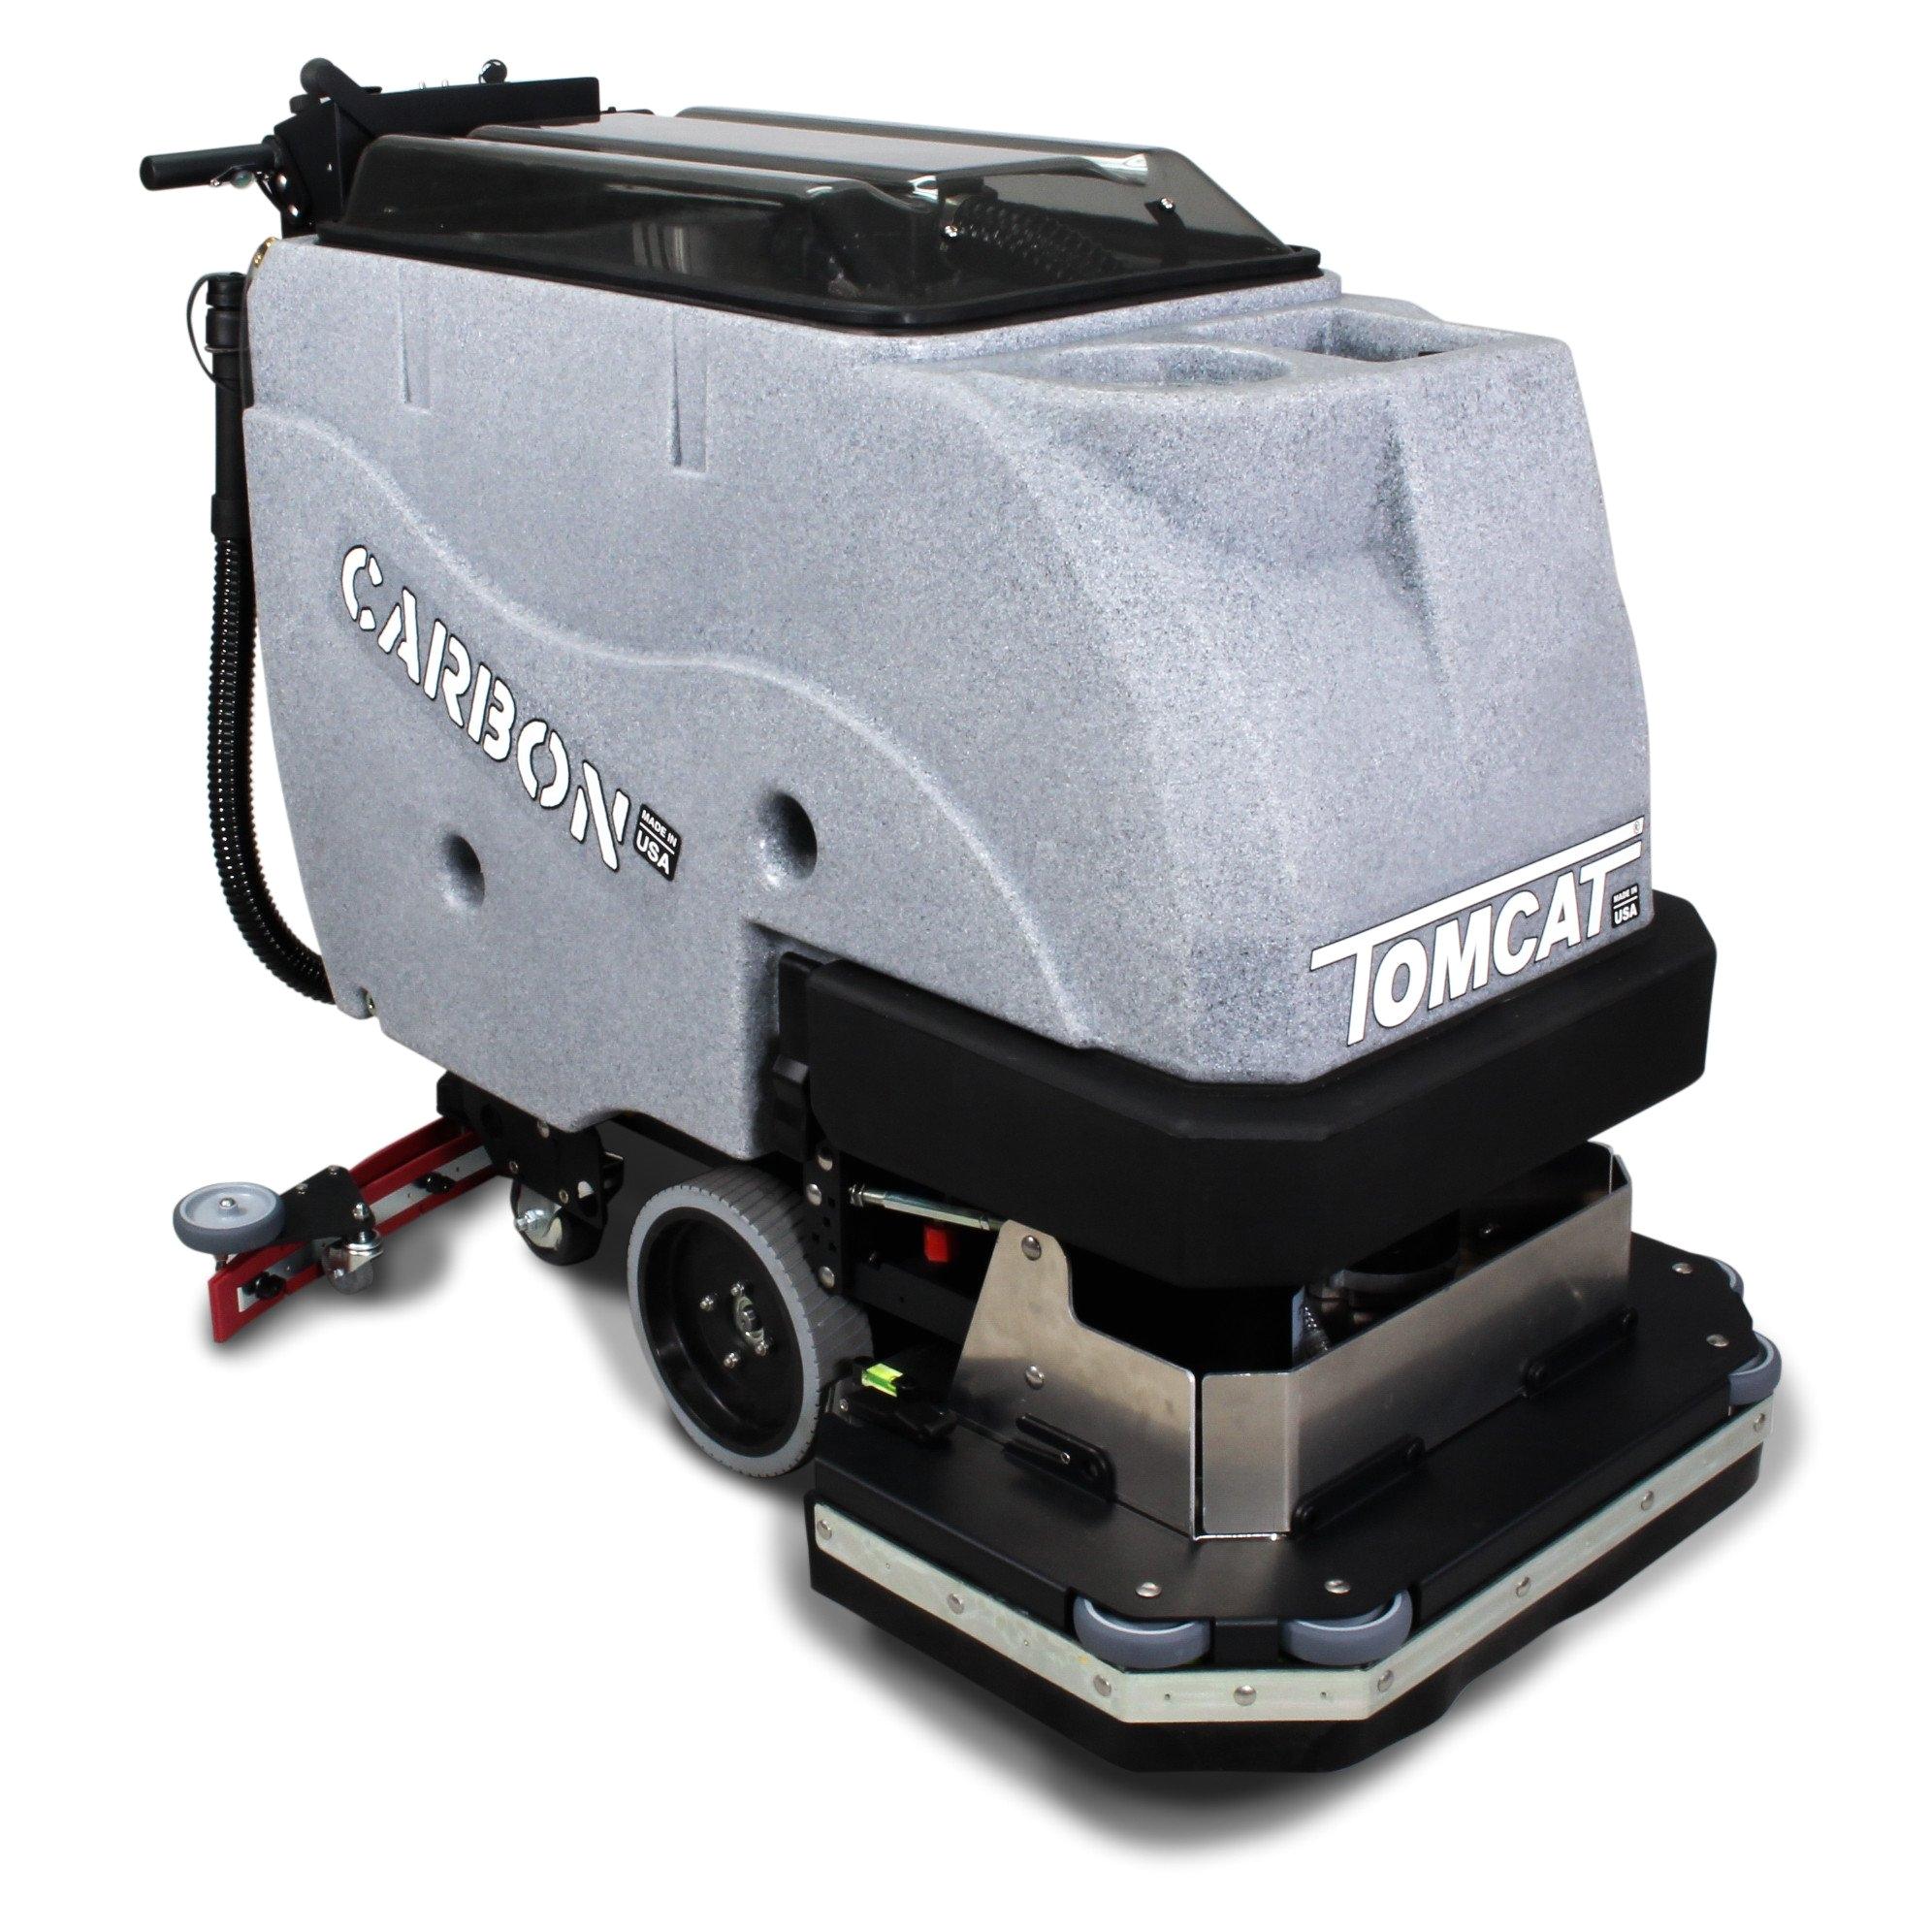 tomcat carbon auto scrubber